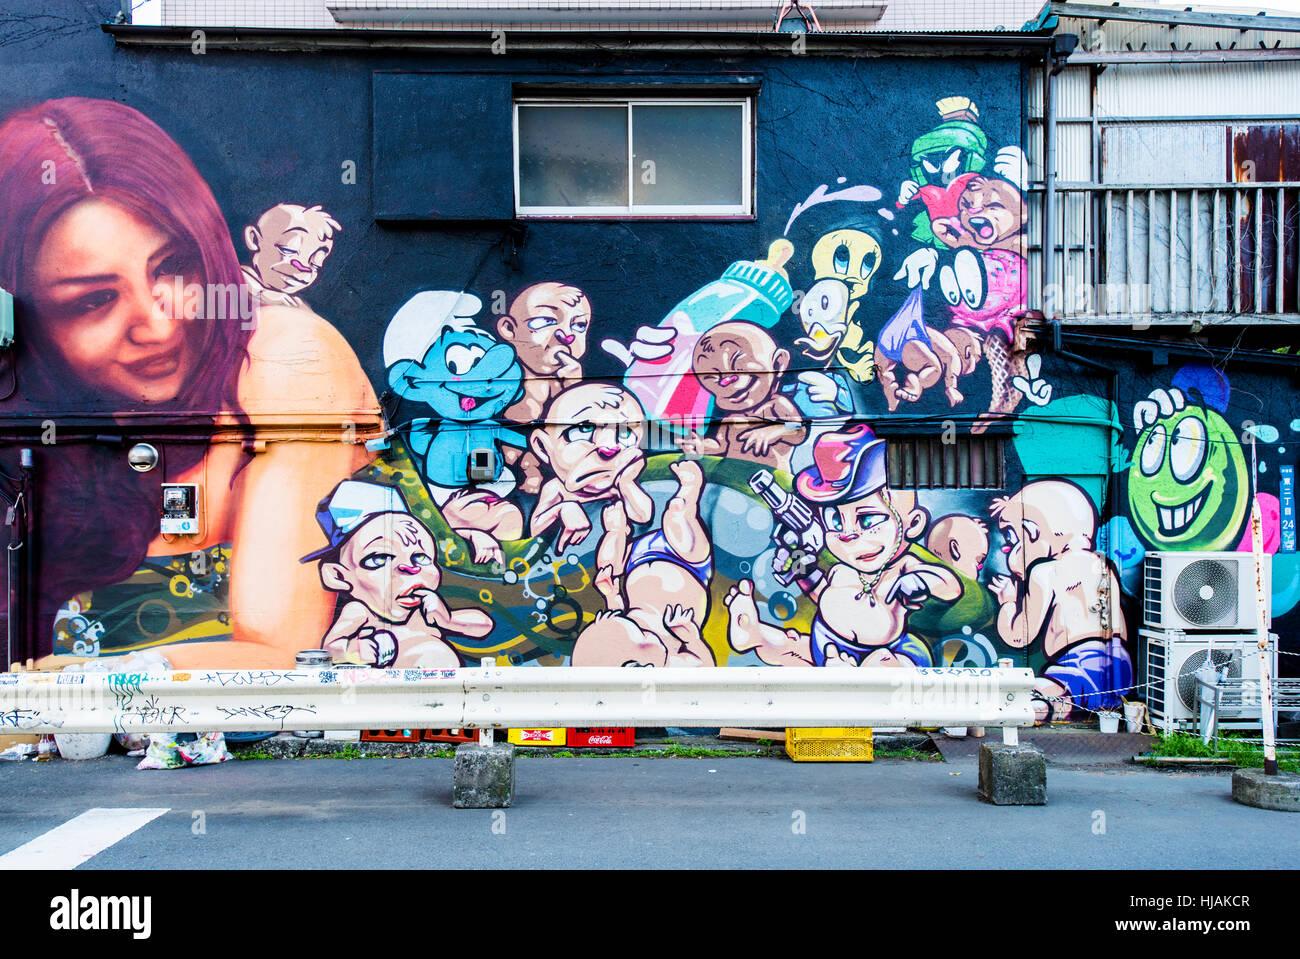 Graffiti wall tokyo - Stock Photo Wall Graffiti In Shibuya Tokyo